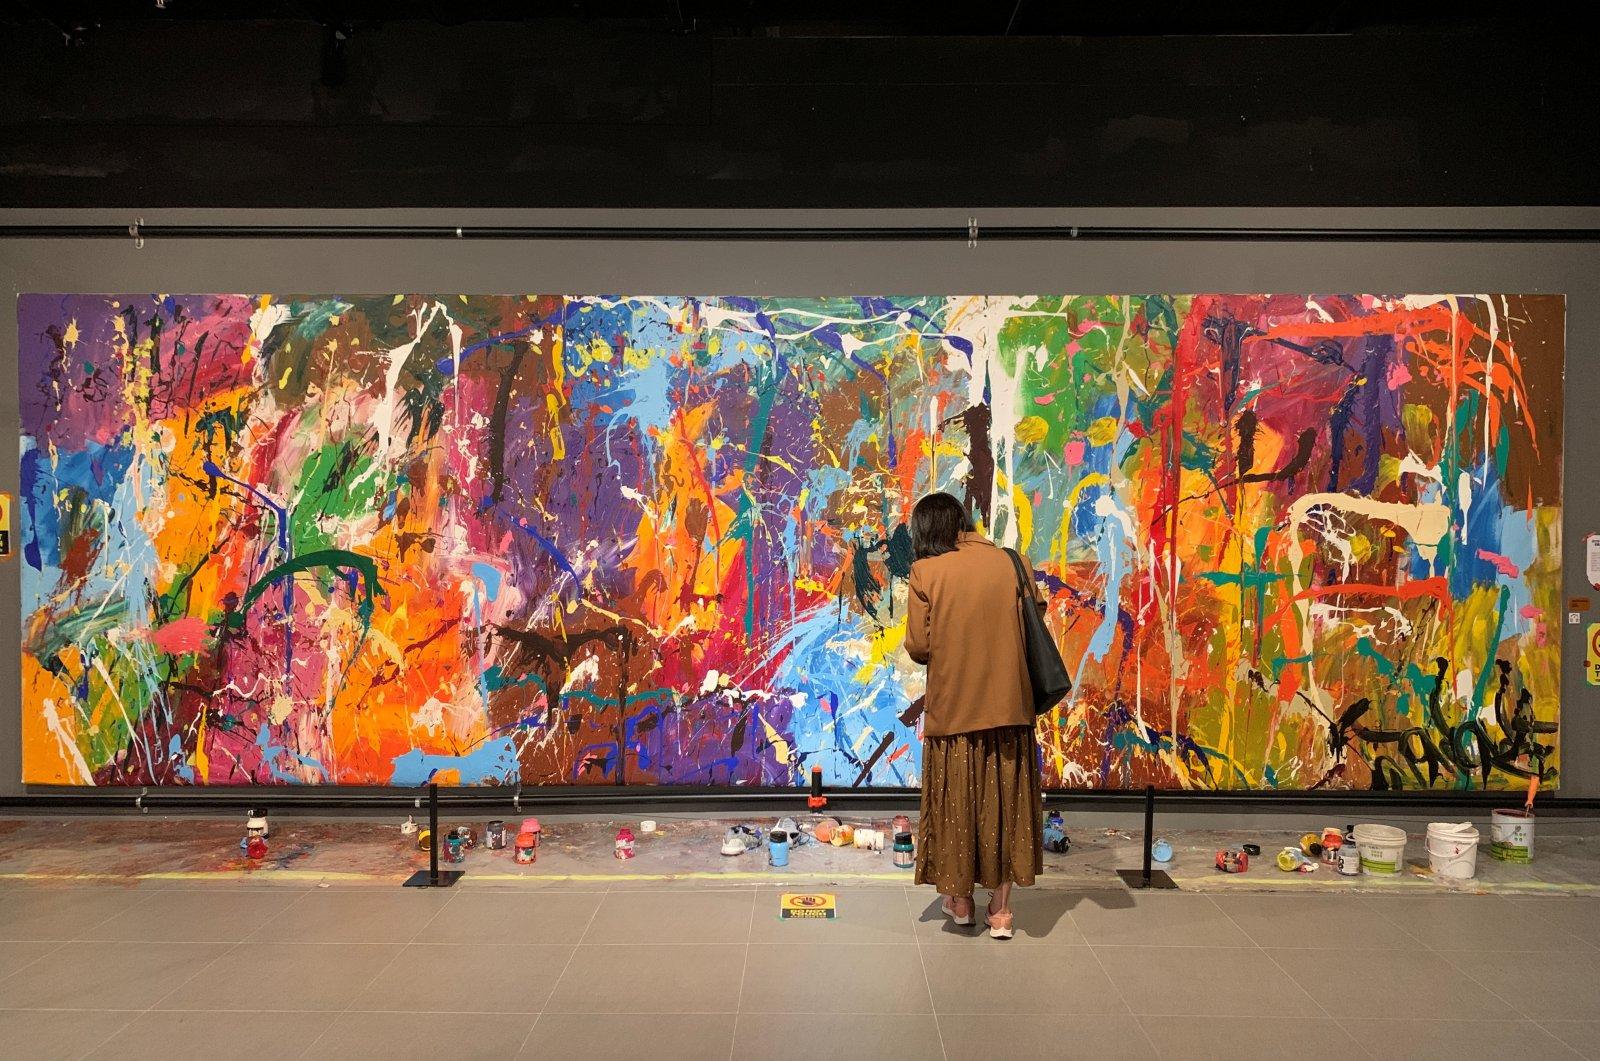 A visitor looks at the graffiti artwork of New York-based artist Jon One, Seoul, South Korea, April 2, 2021. (REUTERS Photo)